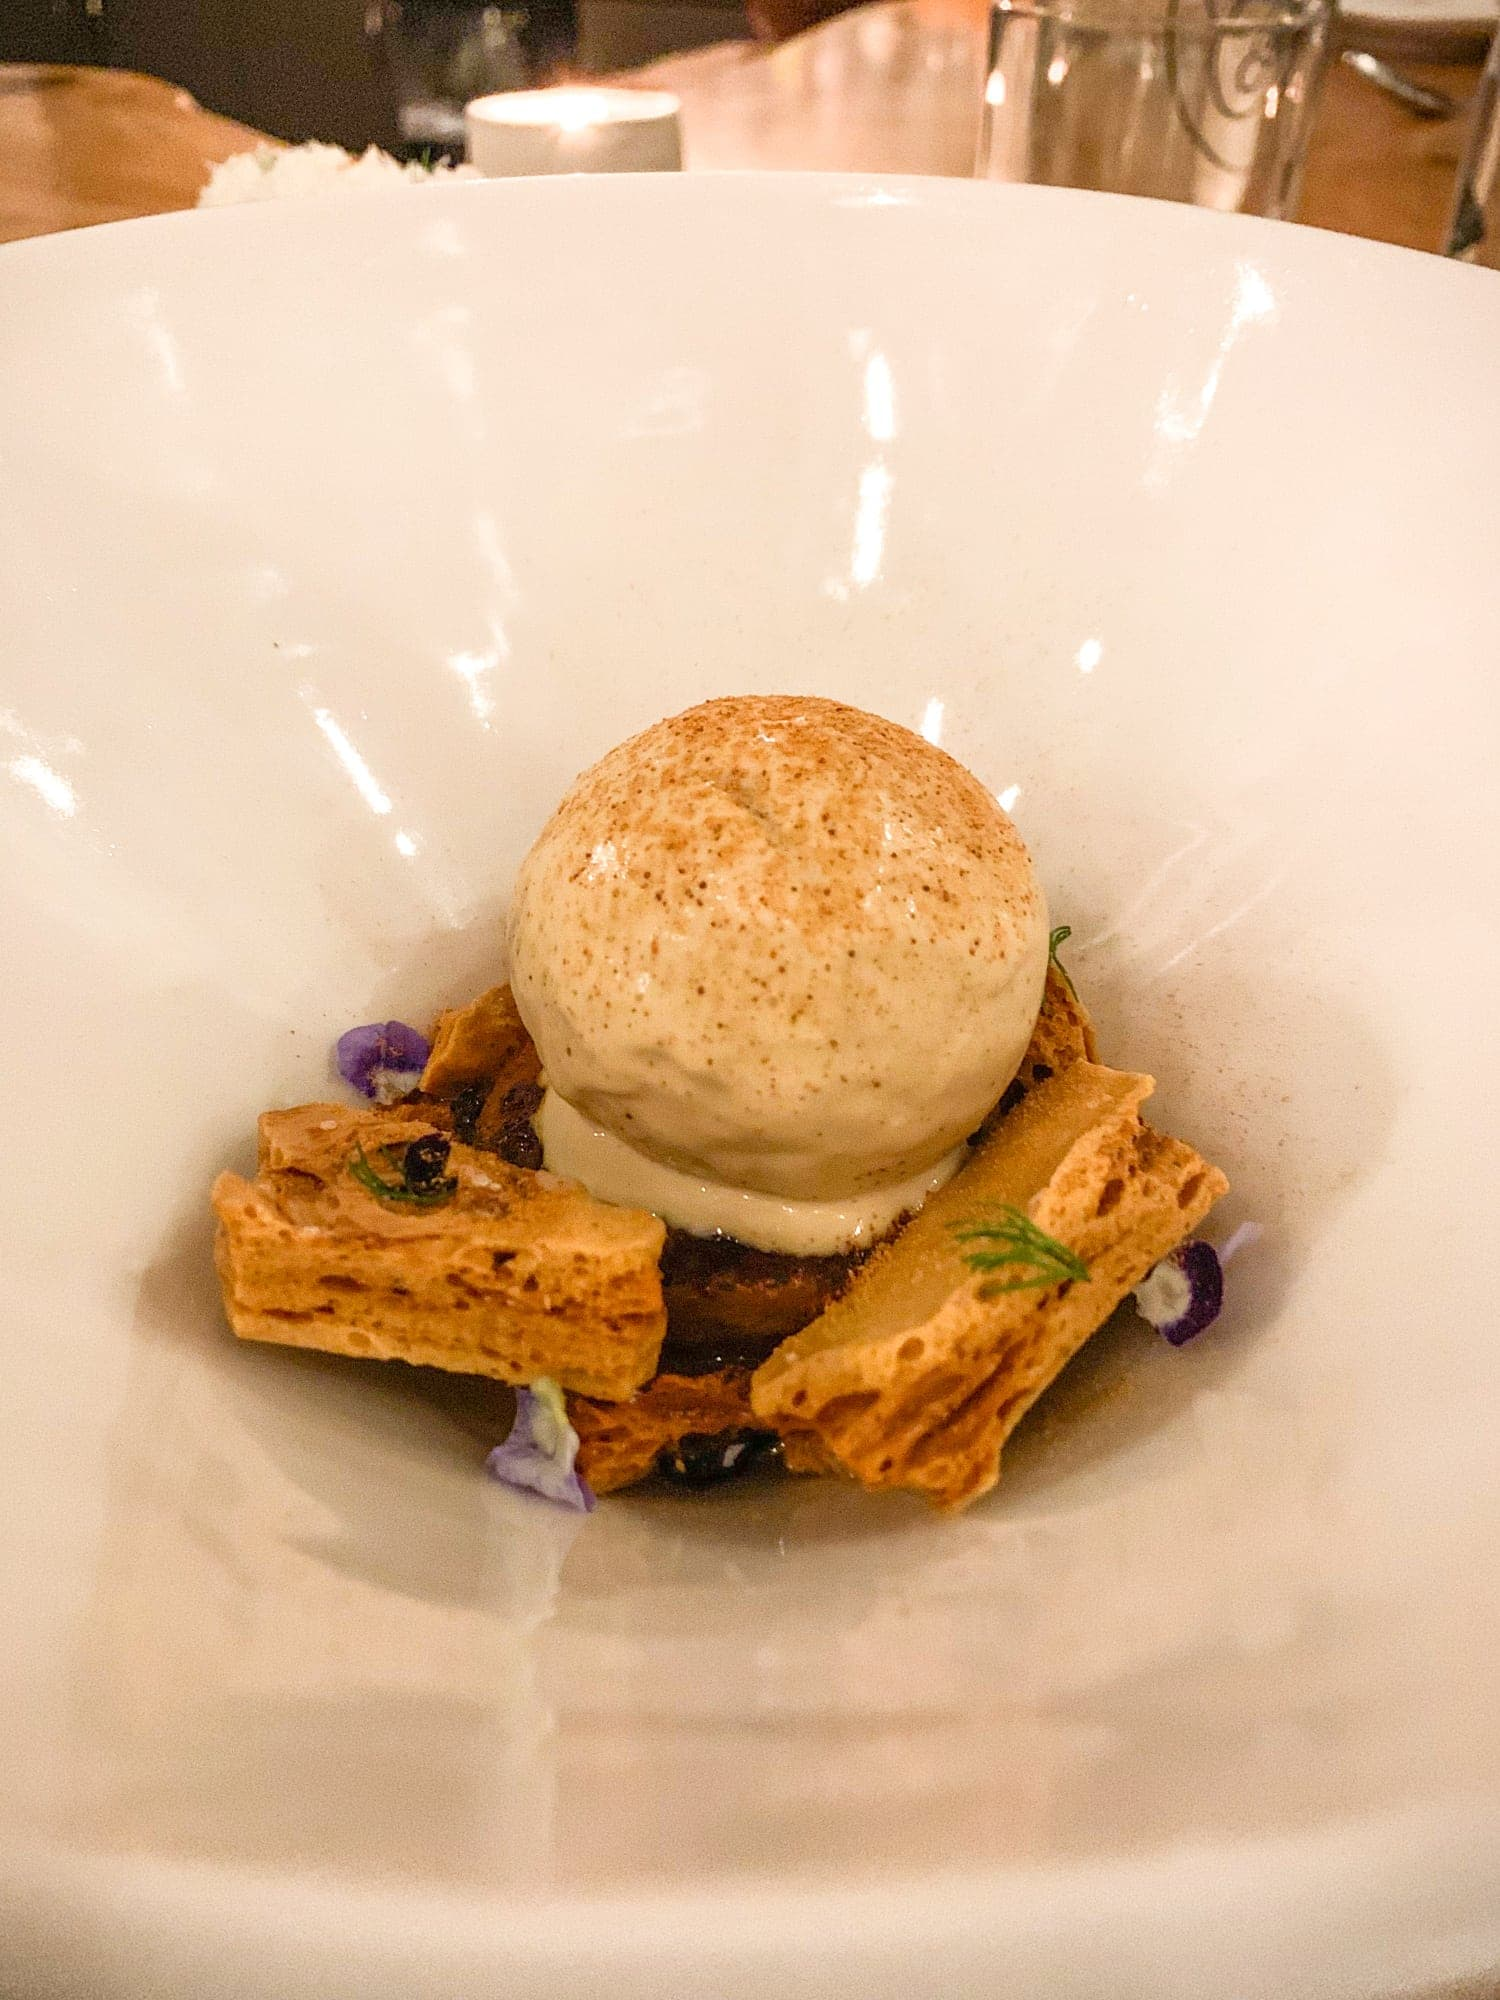 Black garlic caramel ice cream with Nukazuke sweet potato, honeycomb, and wildflower